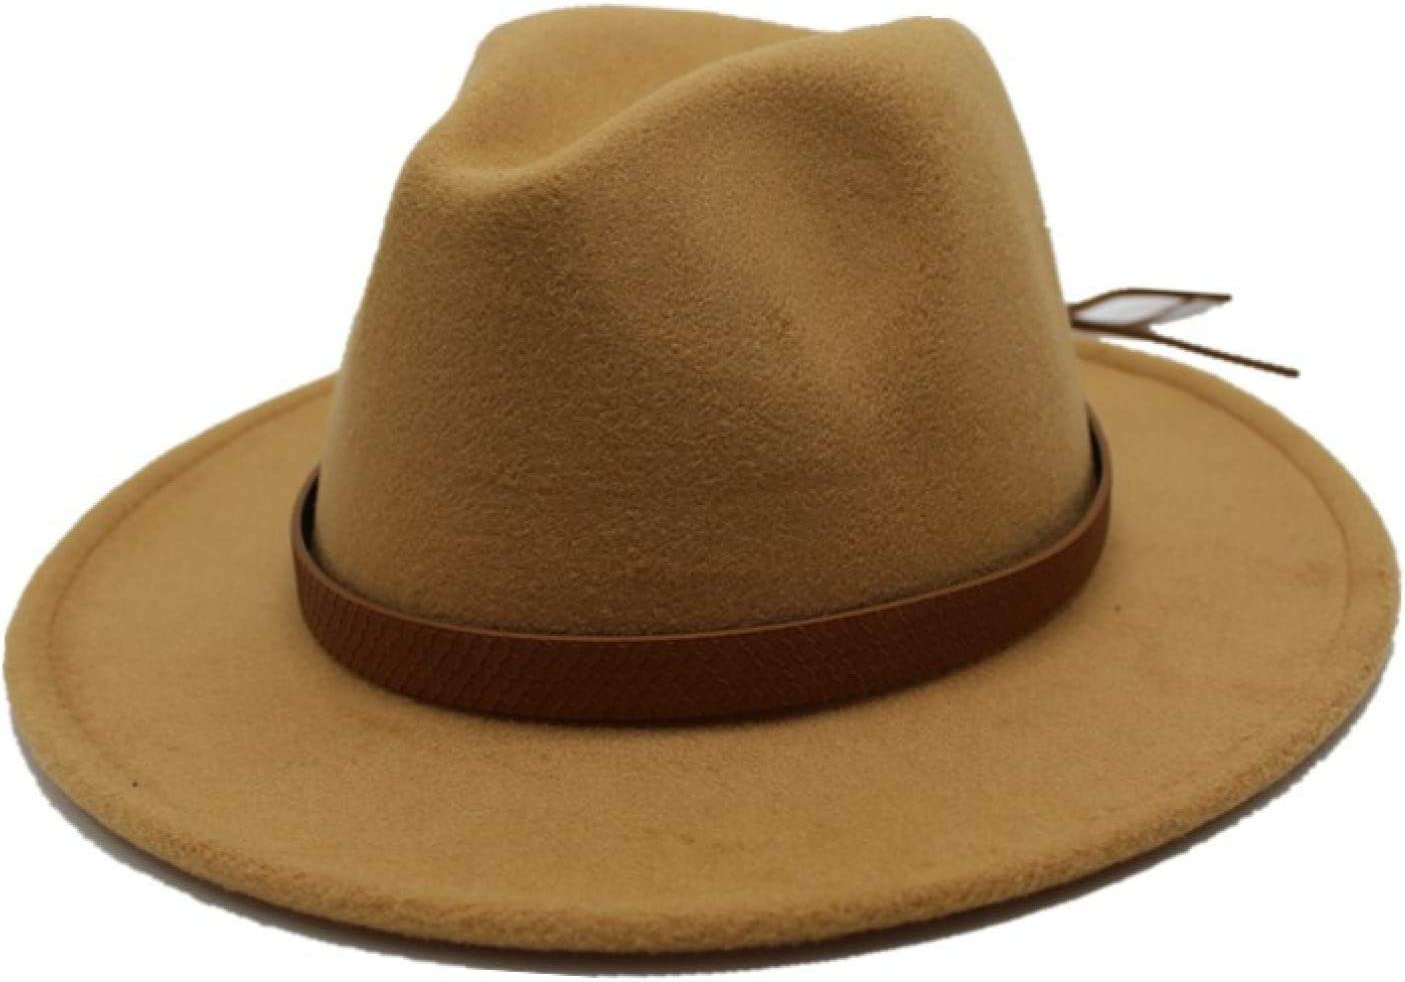 BAJIE Fedora Autumn And Winter Sun Hat Ladies And Men'S Hats Classic Wide Brim Felt Floppy Hat Floppy Hat Imitation Wool Hat